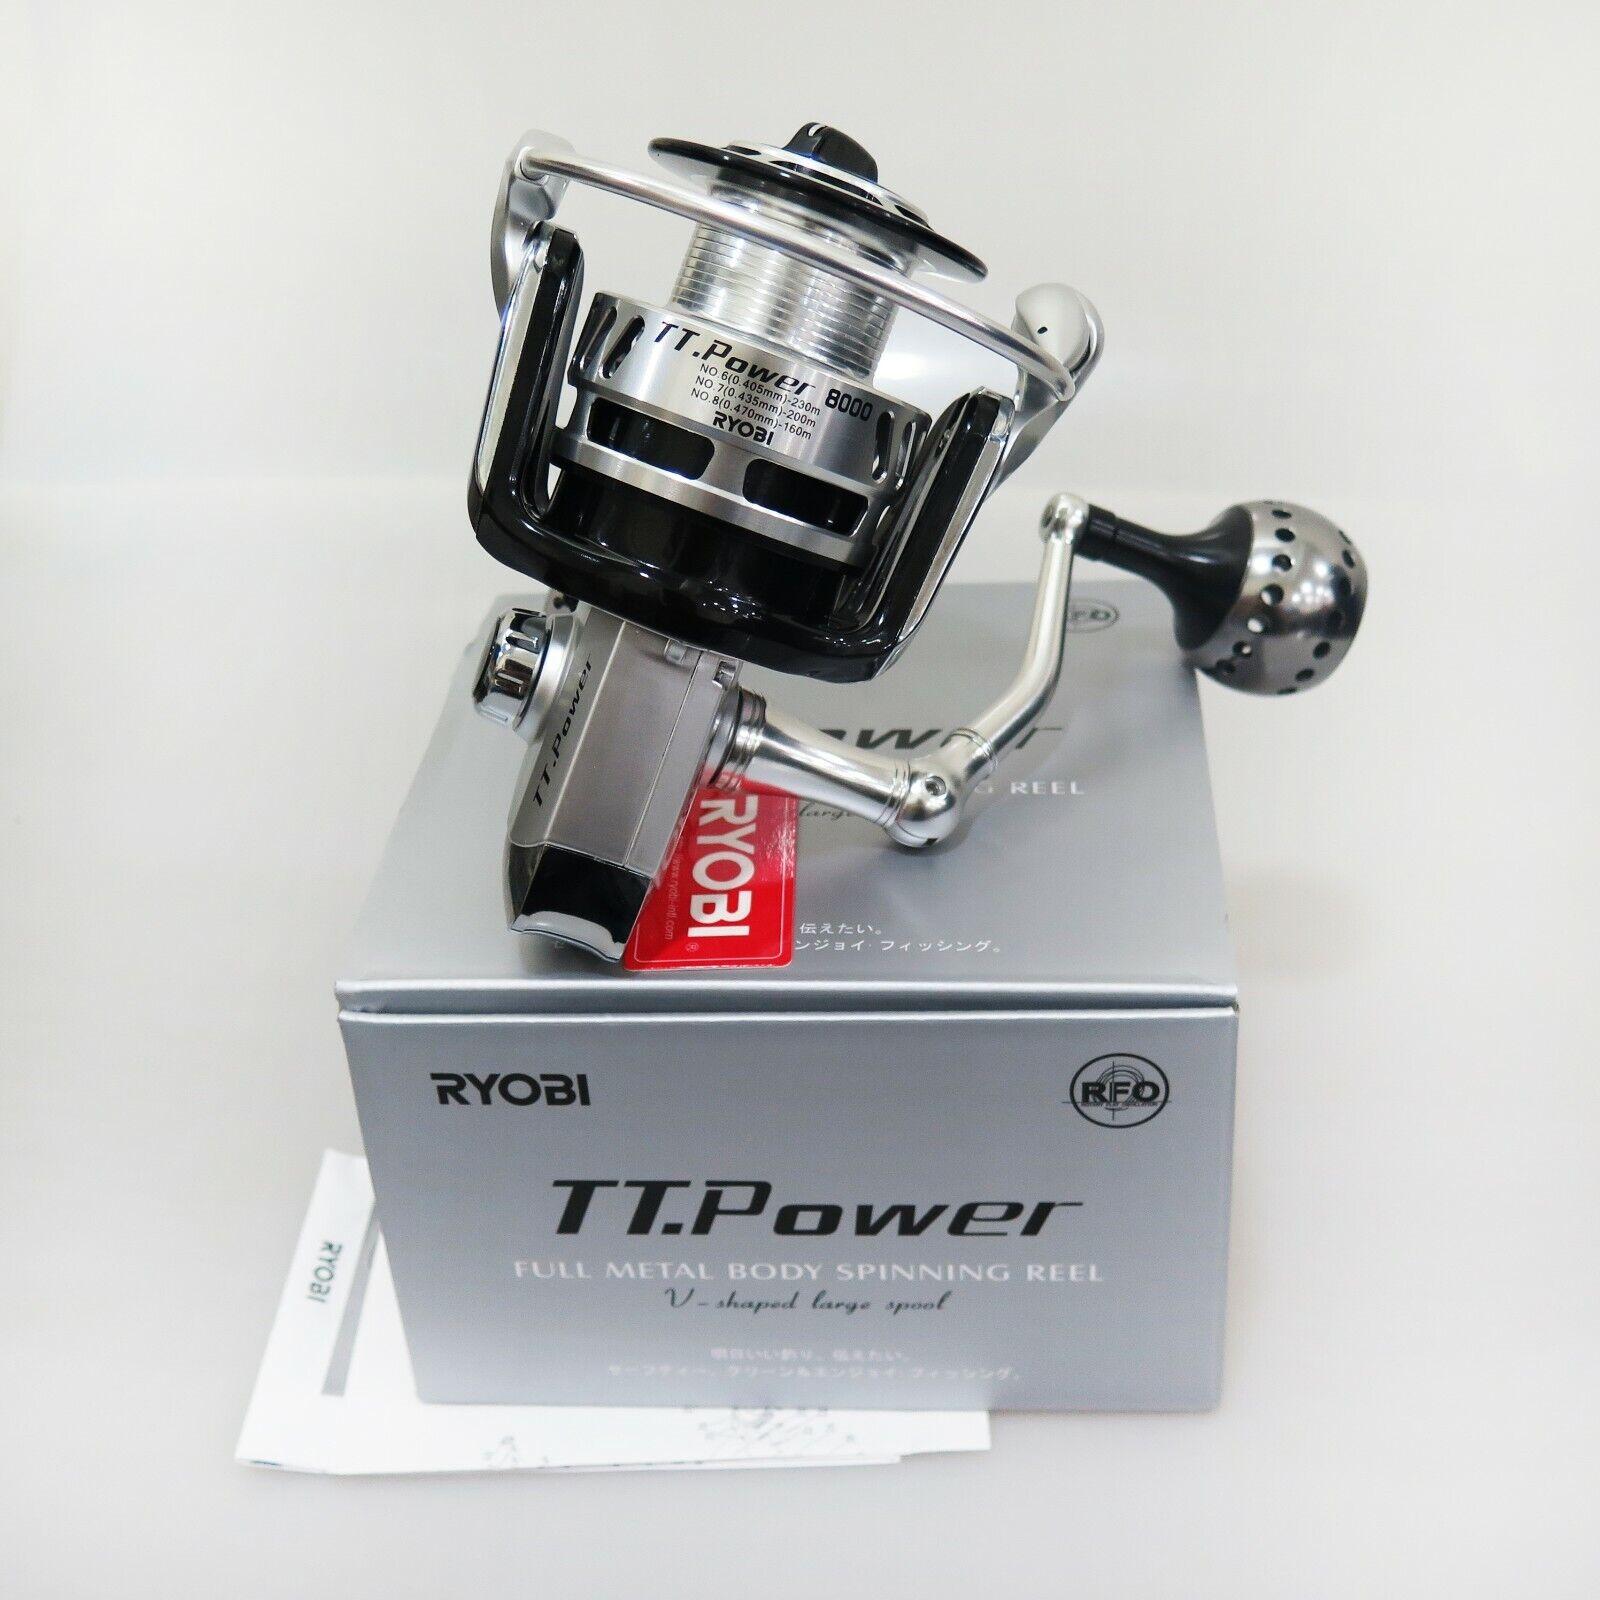 RYOBI TT.energia 8000 Full Metal corpo Spinning Reel Fedex shipping 2days to Usa